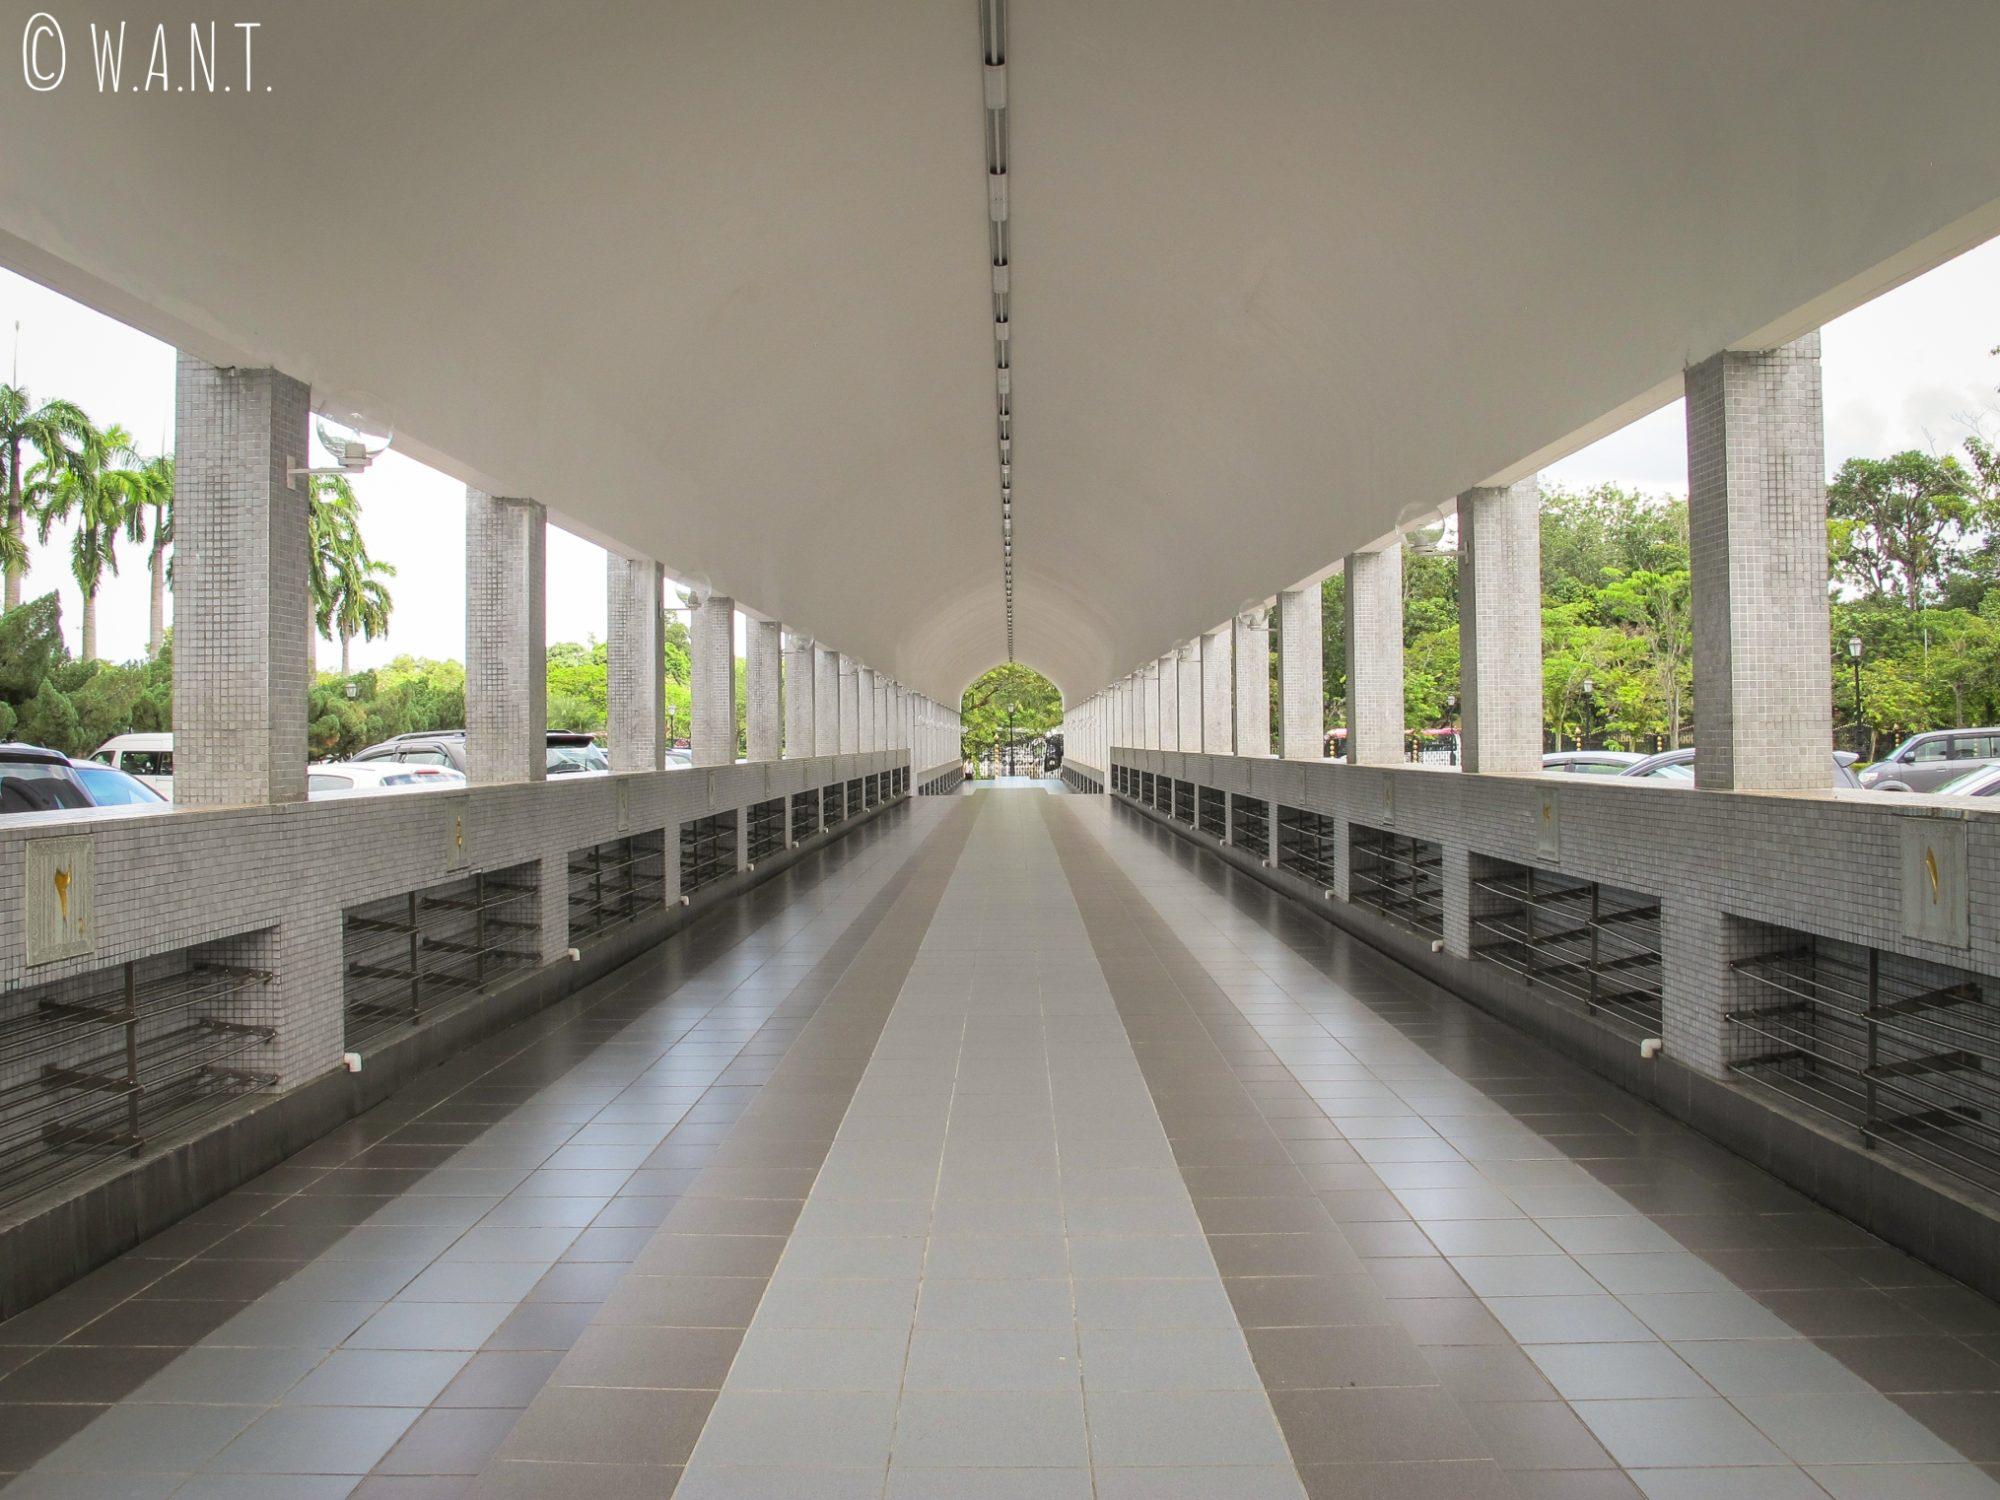 Allée d'entrée à la mosquée Masjid Jame'Asr Hassanil Bolkiah de Bandar Seri Begawan